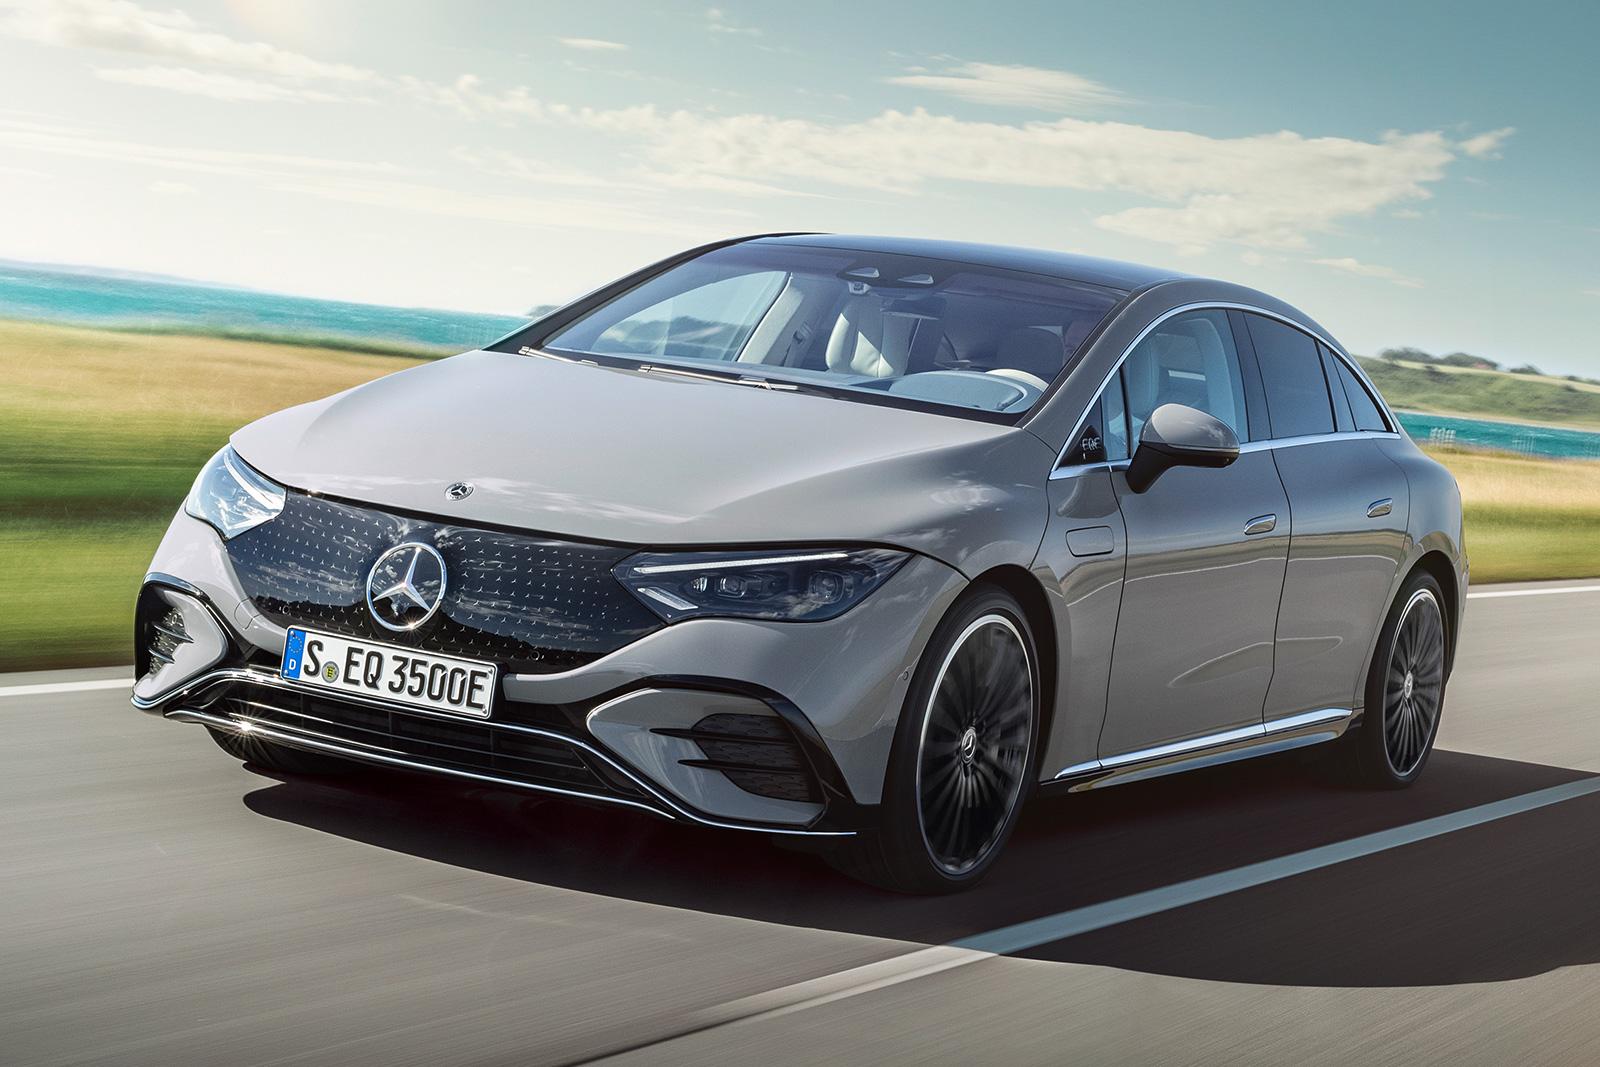 Mercedes-Benz EQE electric sedan